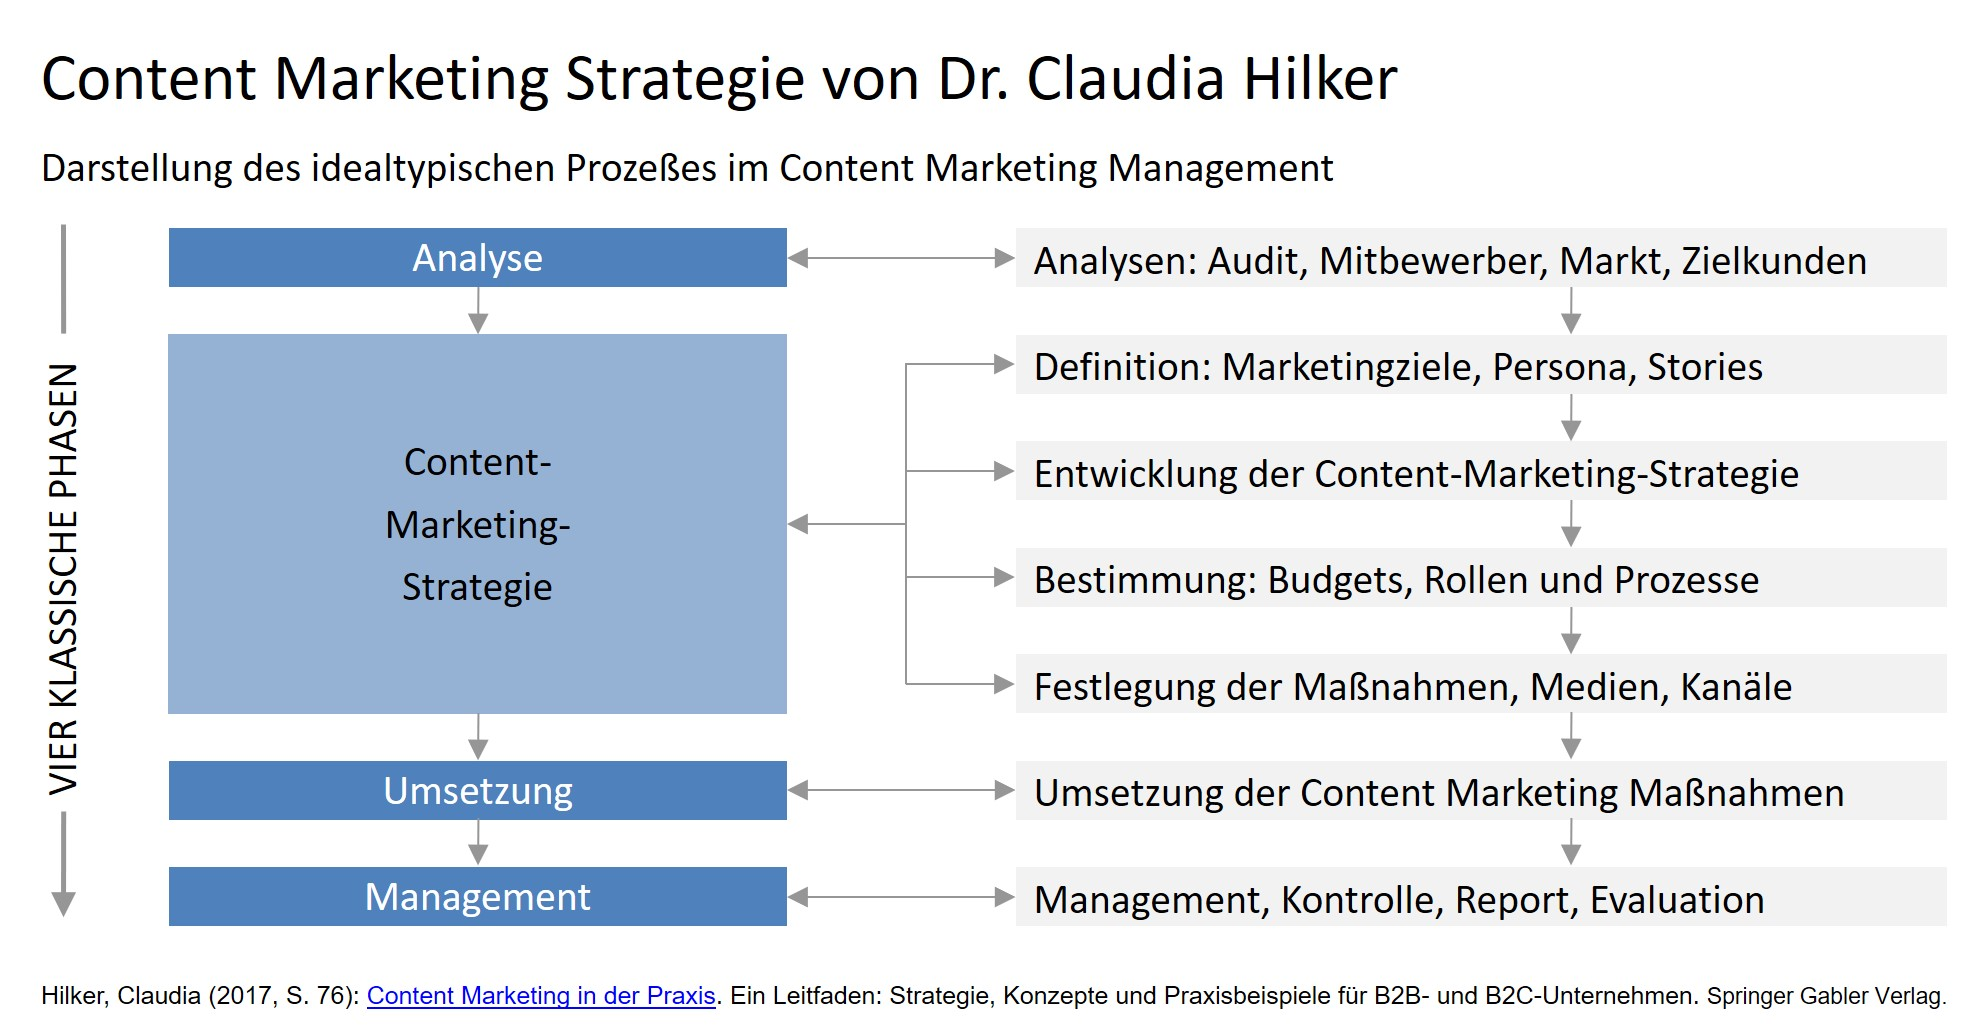 Content Marketing Strategie Claudia Hilker